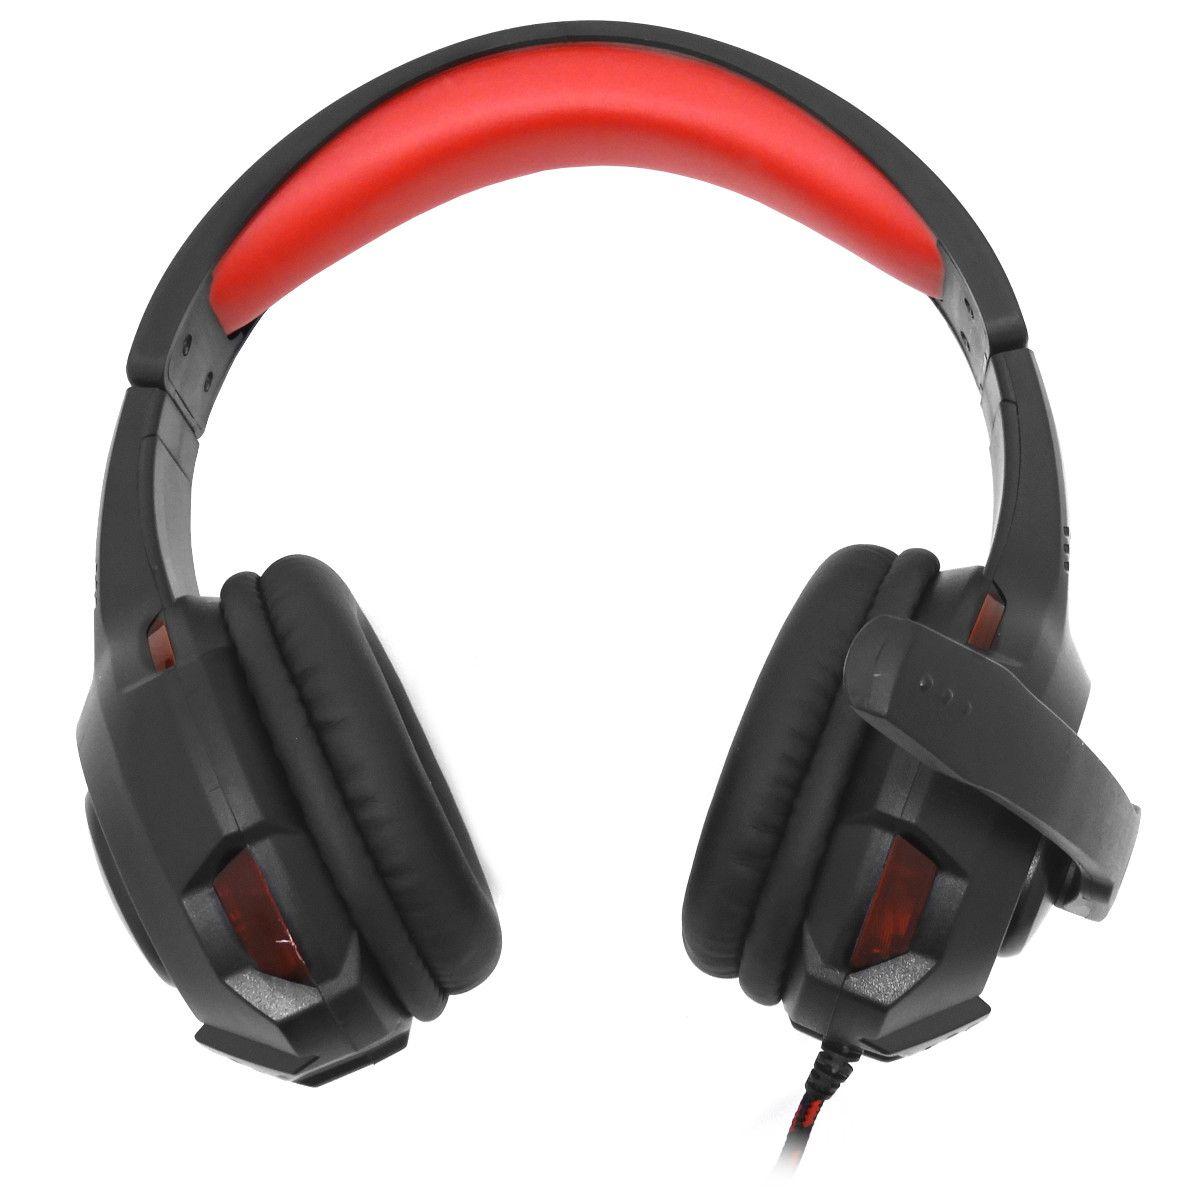 Headset Gamer Led Microfone super Bass Bright-0468